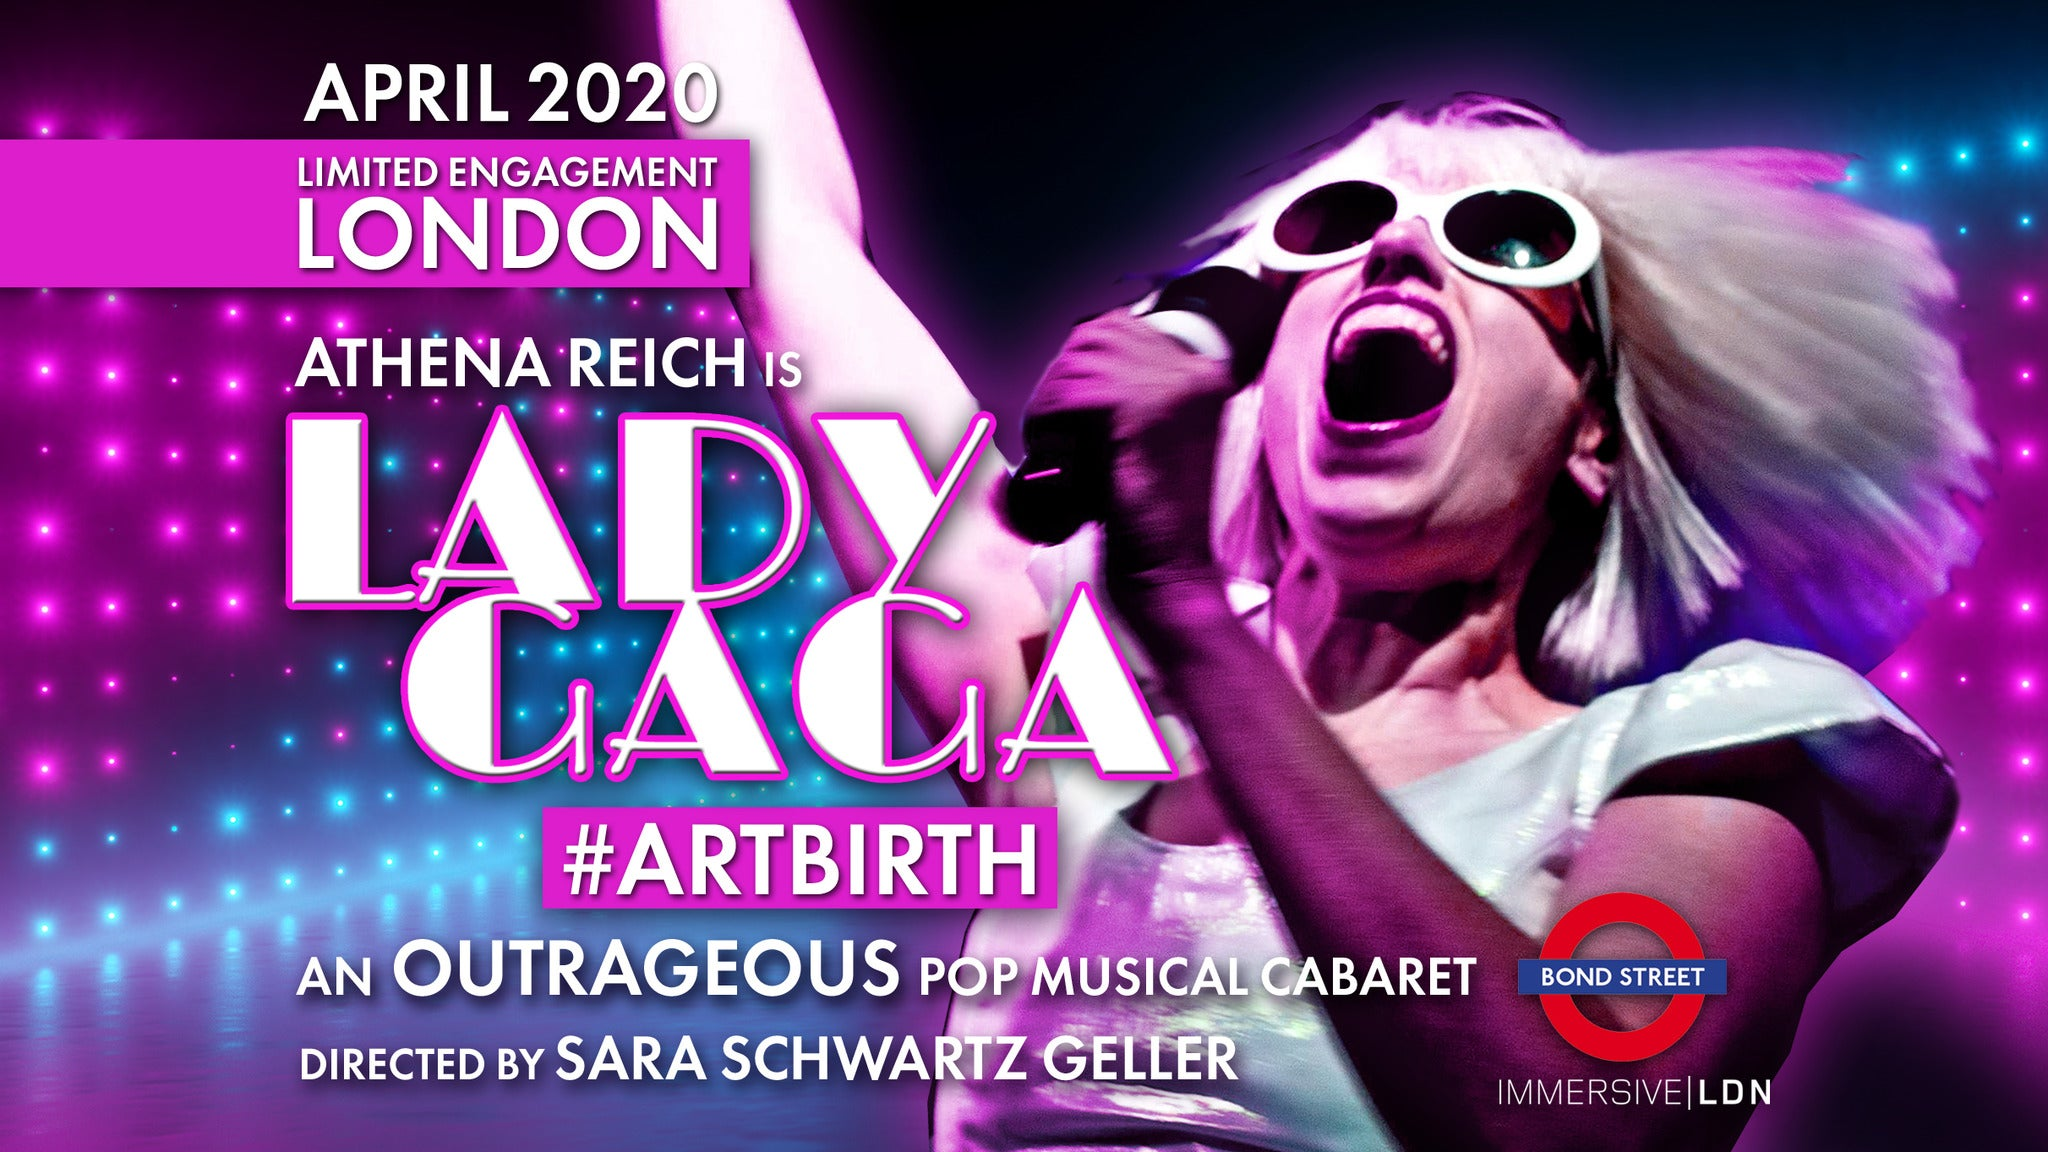 Artbirth - Lady Gaga Show Event Title Pic